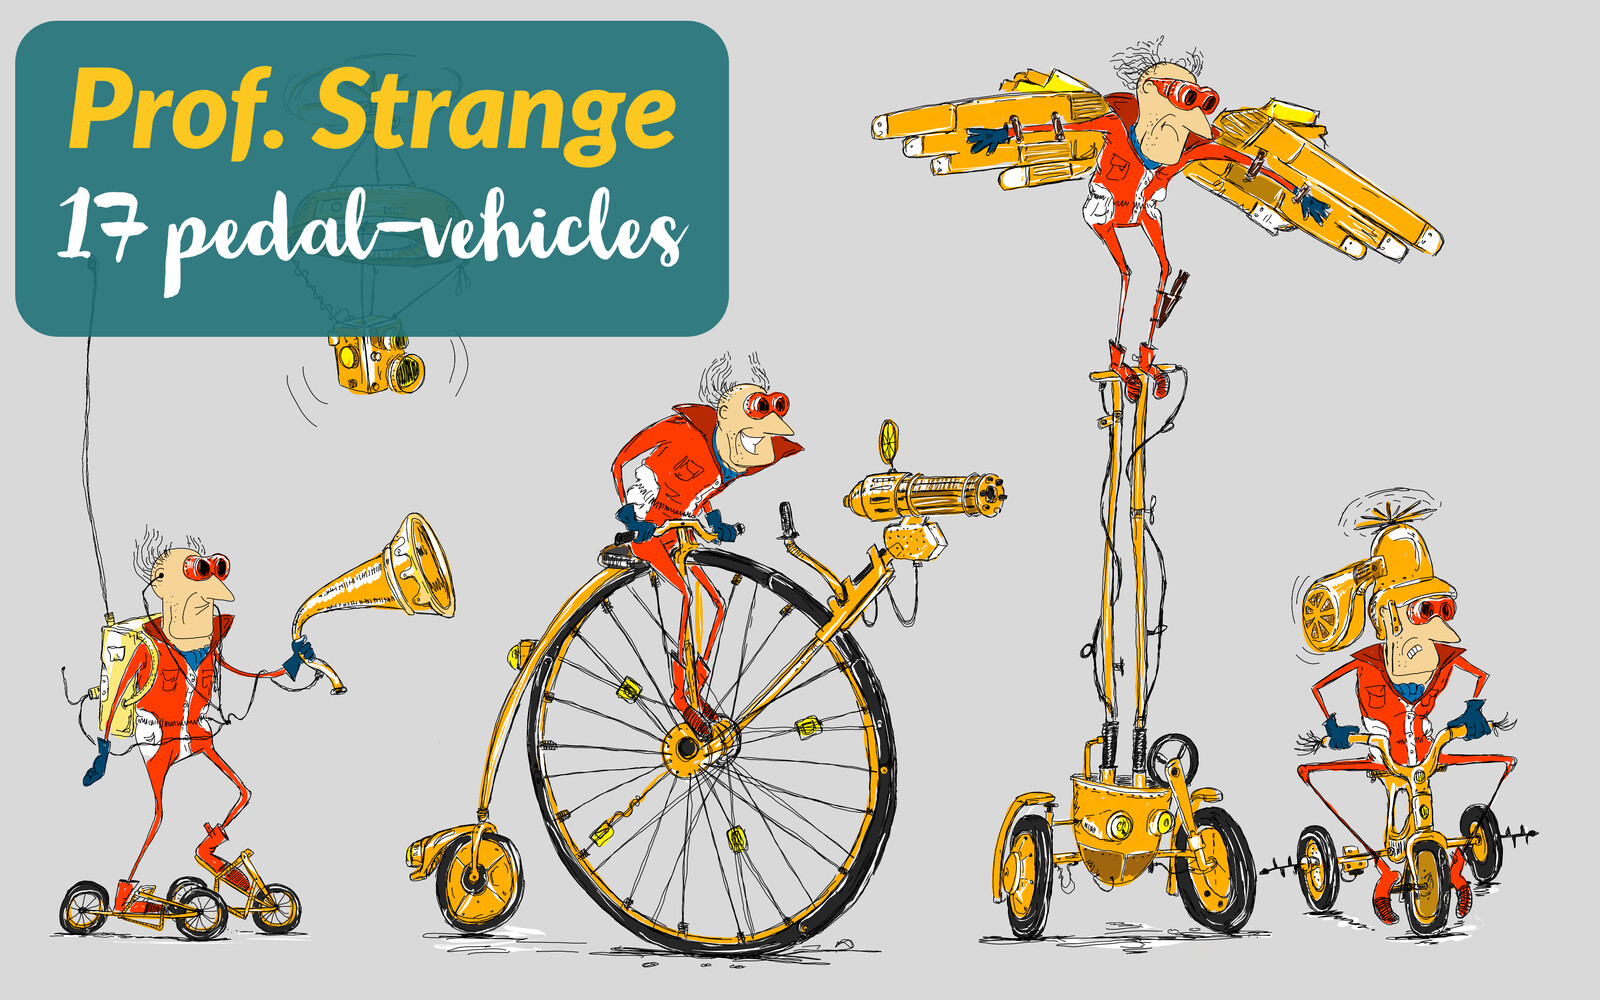 17 Pedal-Vehicles by Prof. Strange